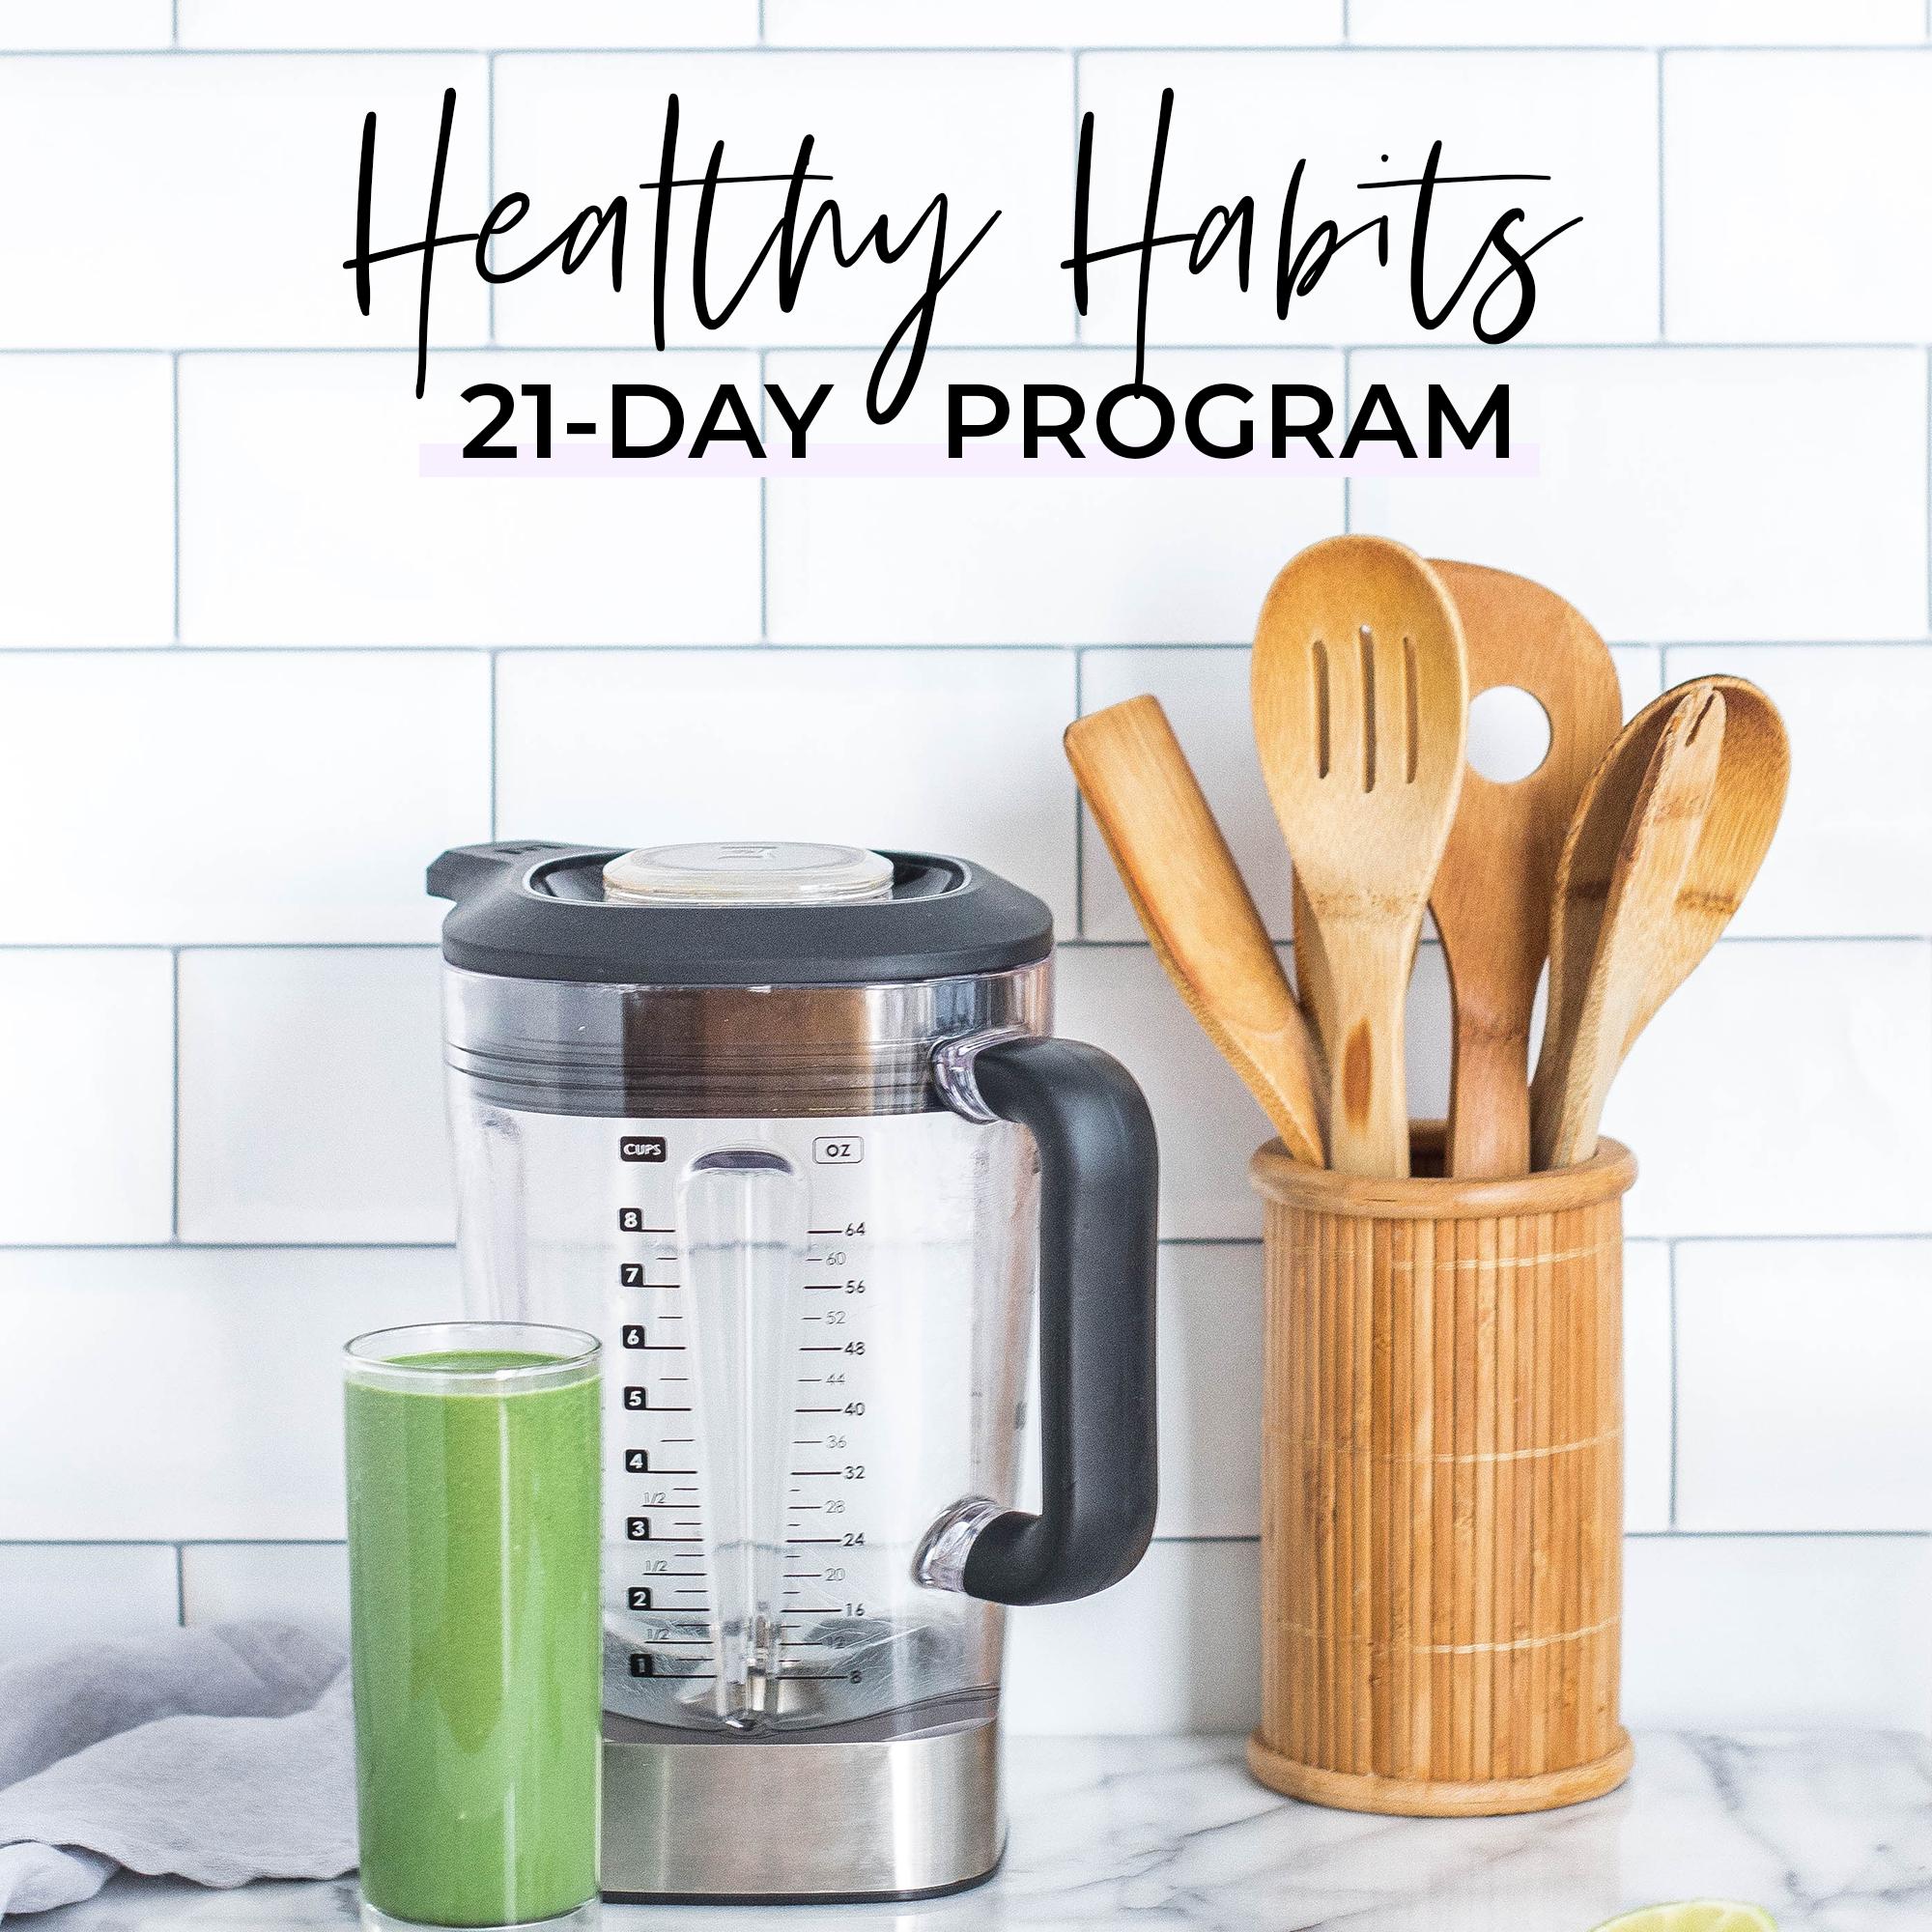 HH program - green smoothie in blender purple.png